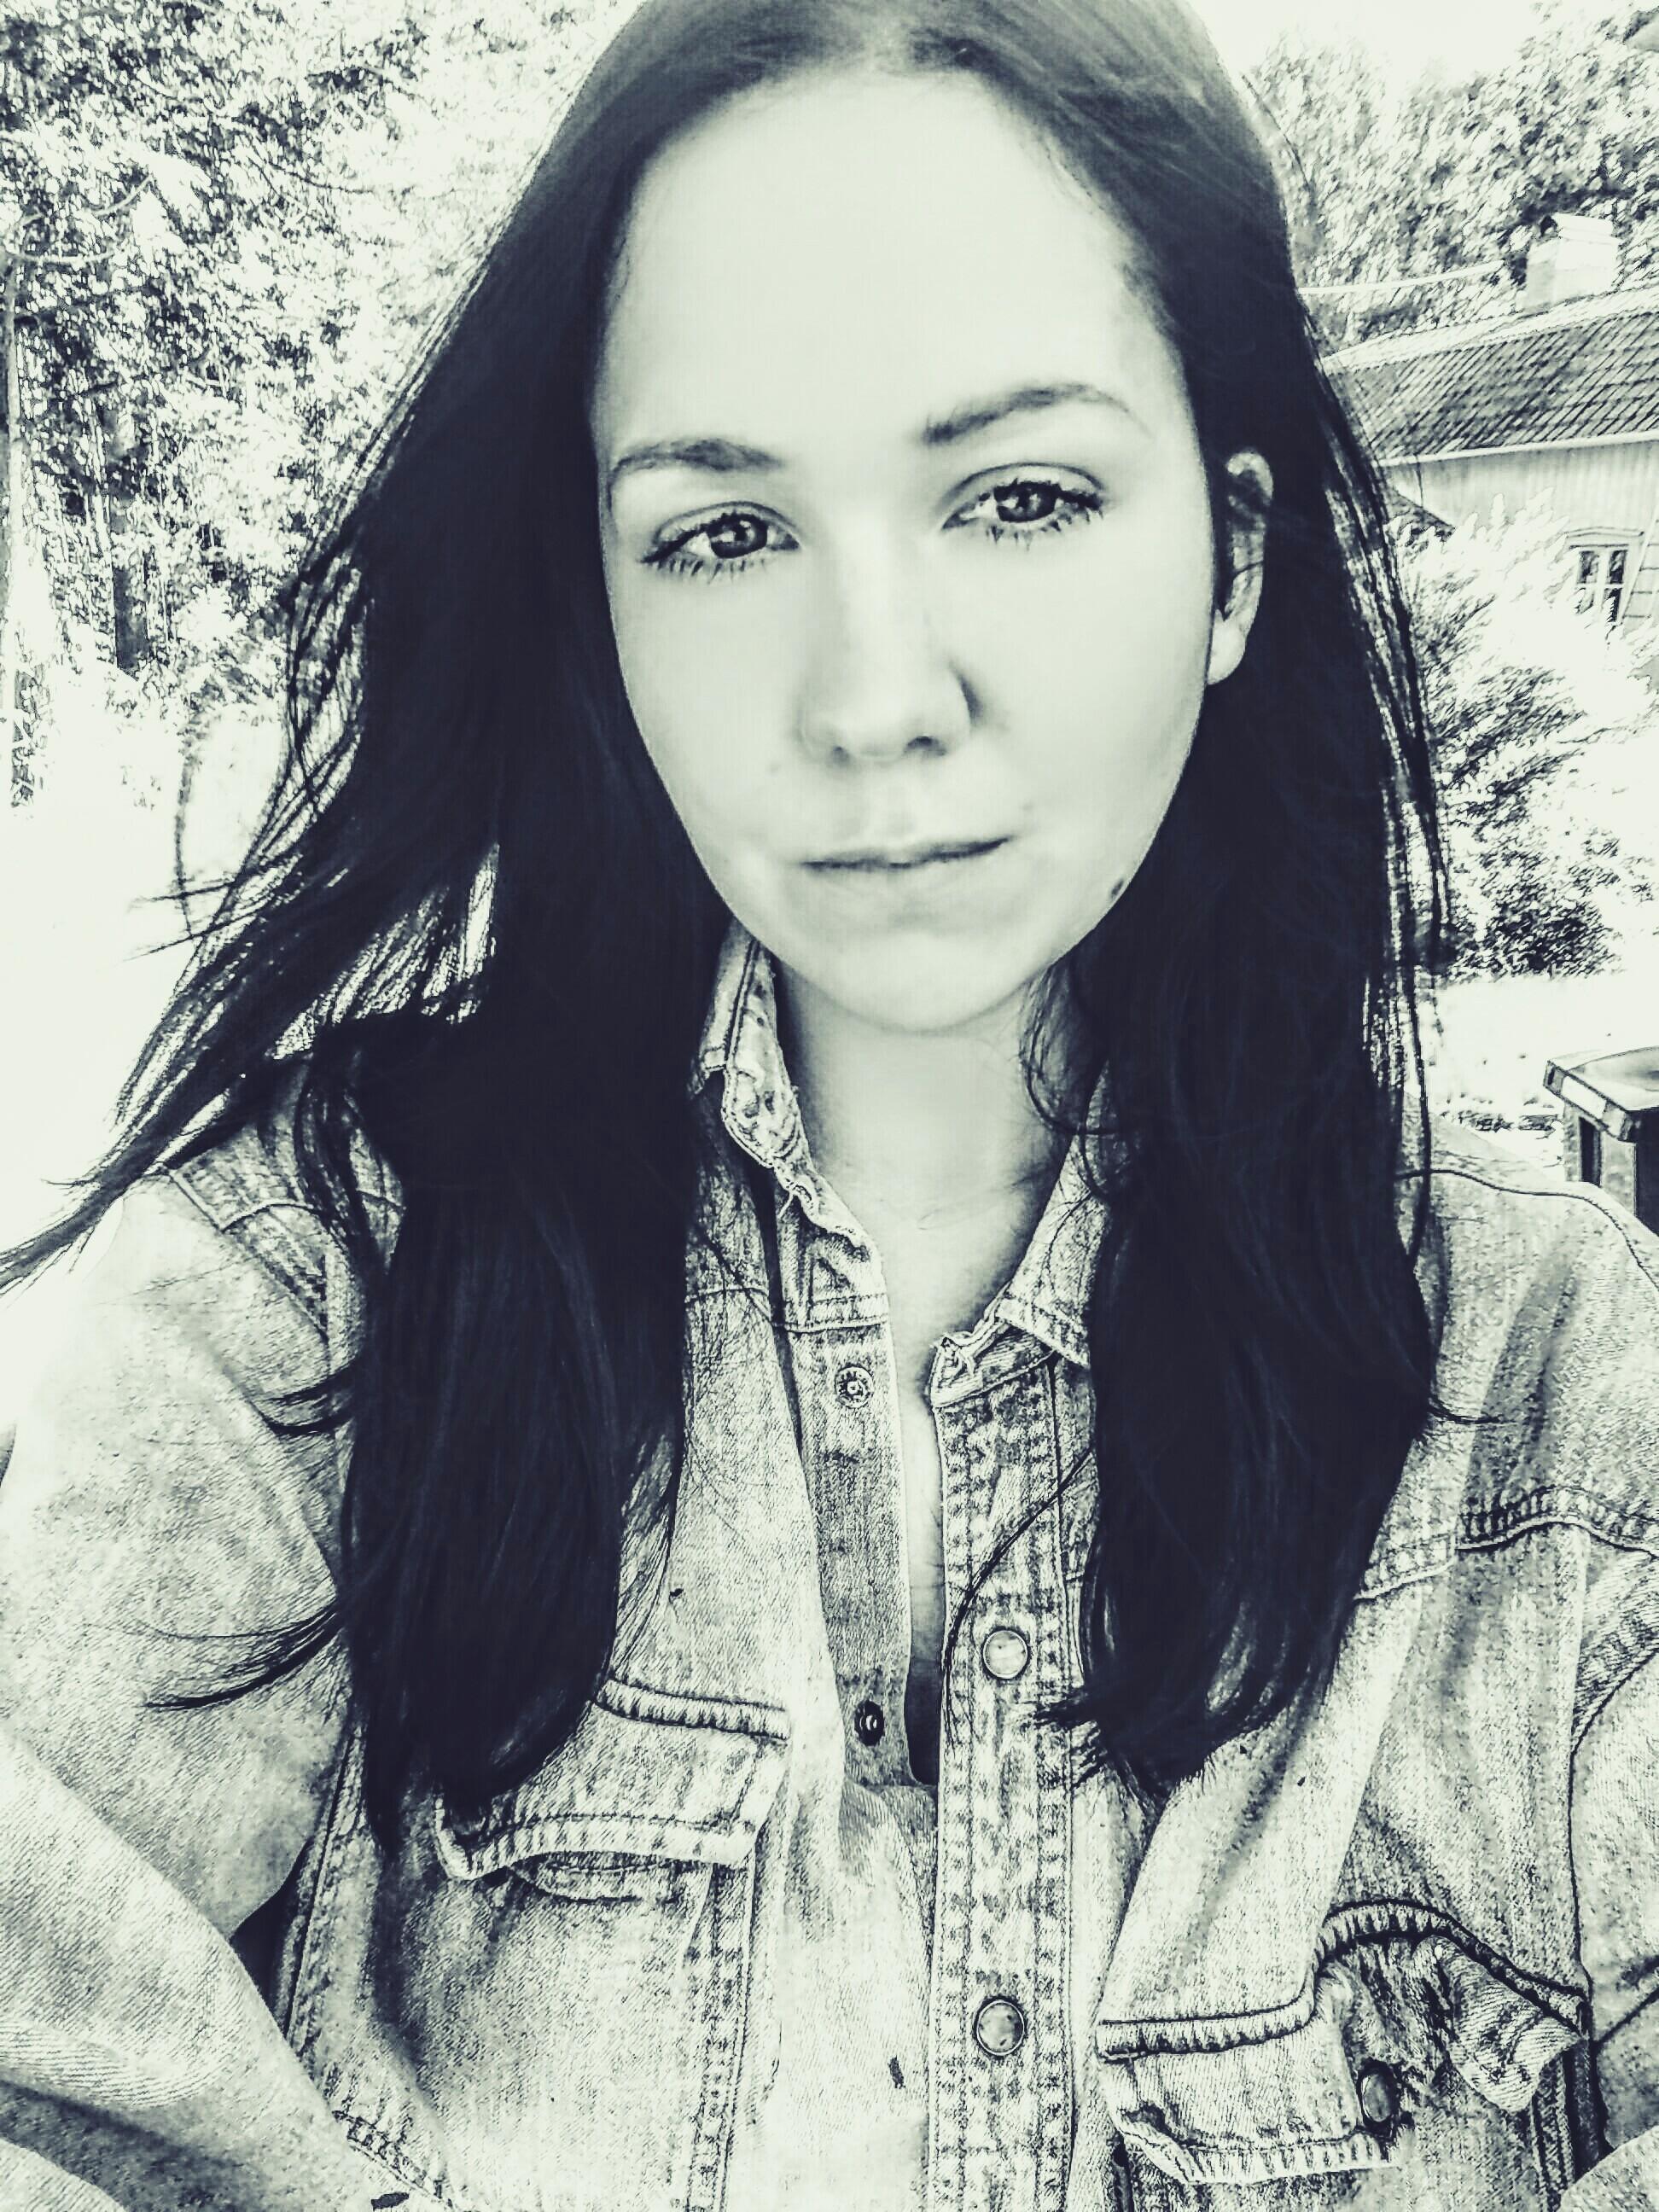 Kaisa Pantzar - Ömhetsgrann